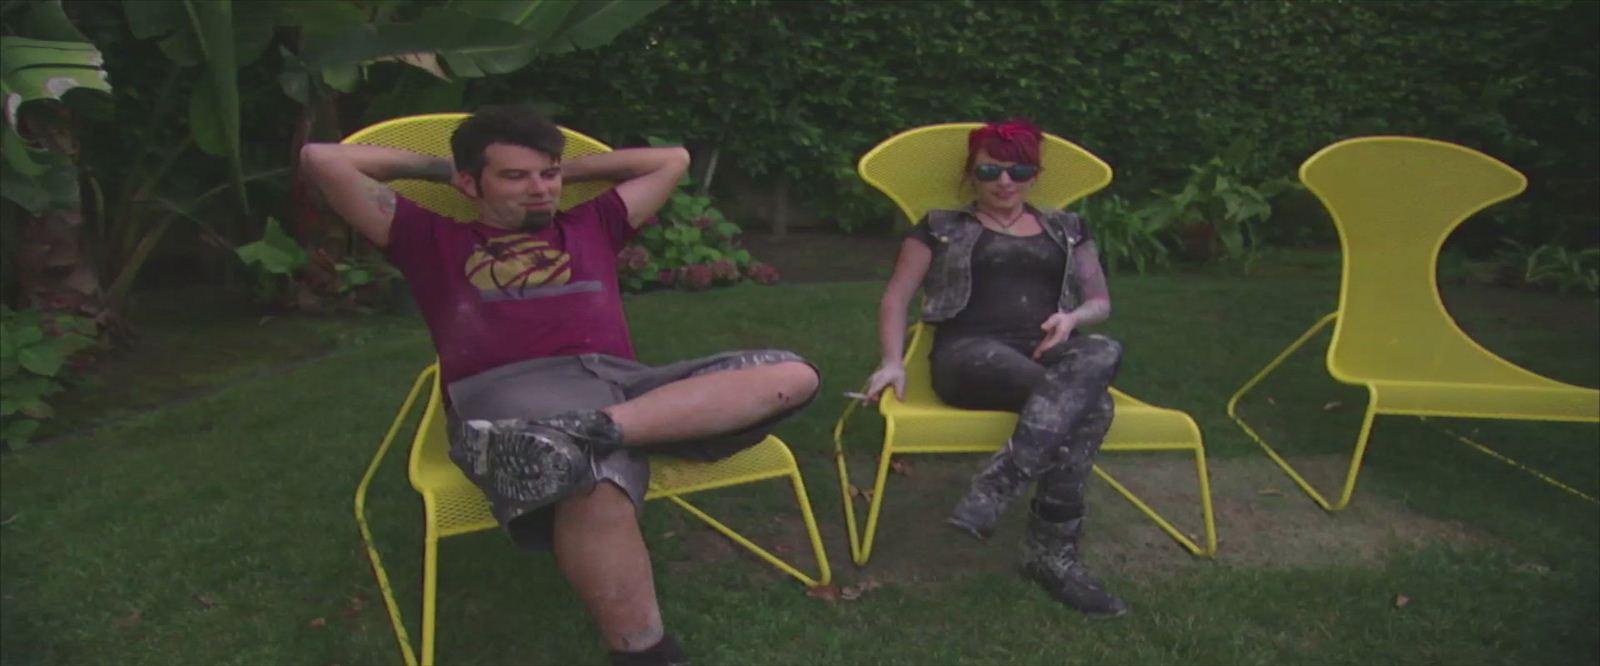 Bonus Scene - Graham & Chloe Get Real